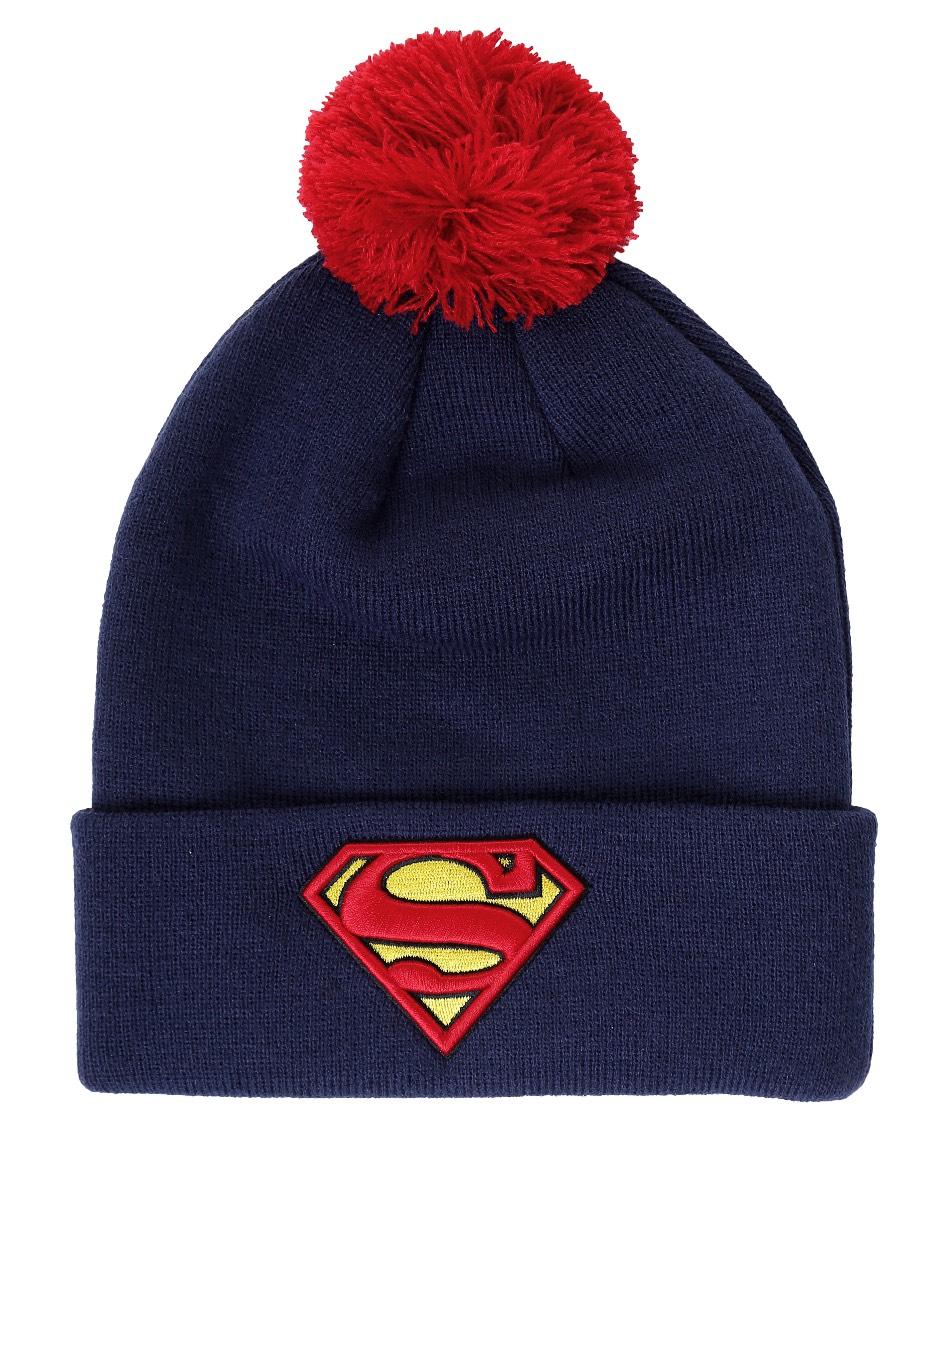 041210ca532 Superman - Superman - Beanie - Impericon.com US